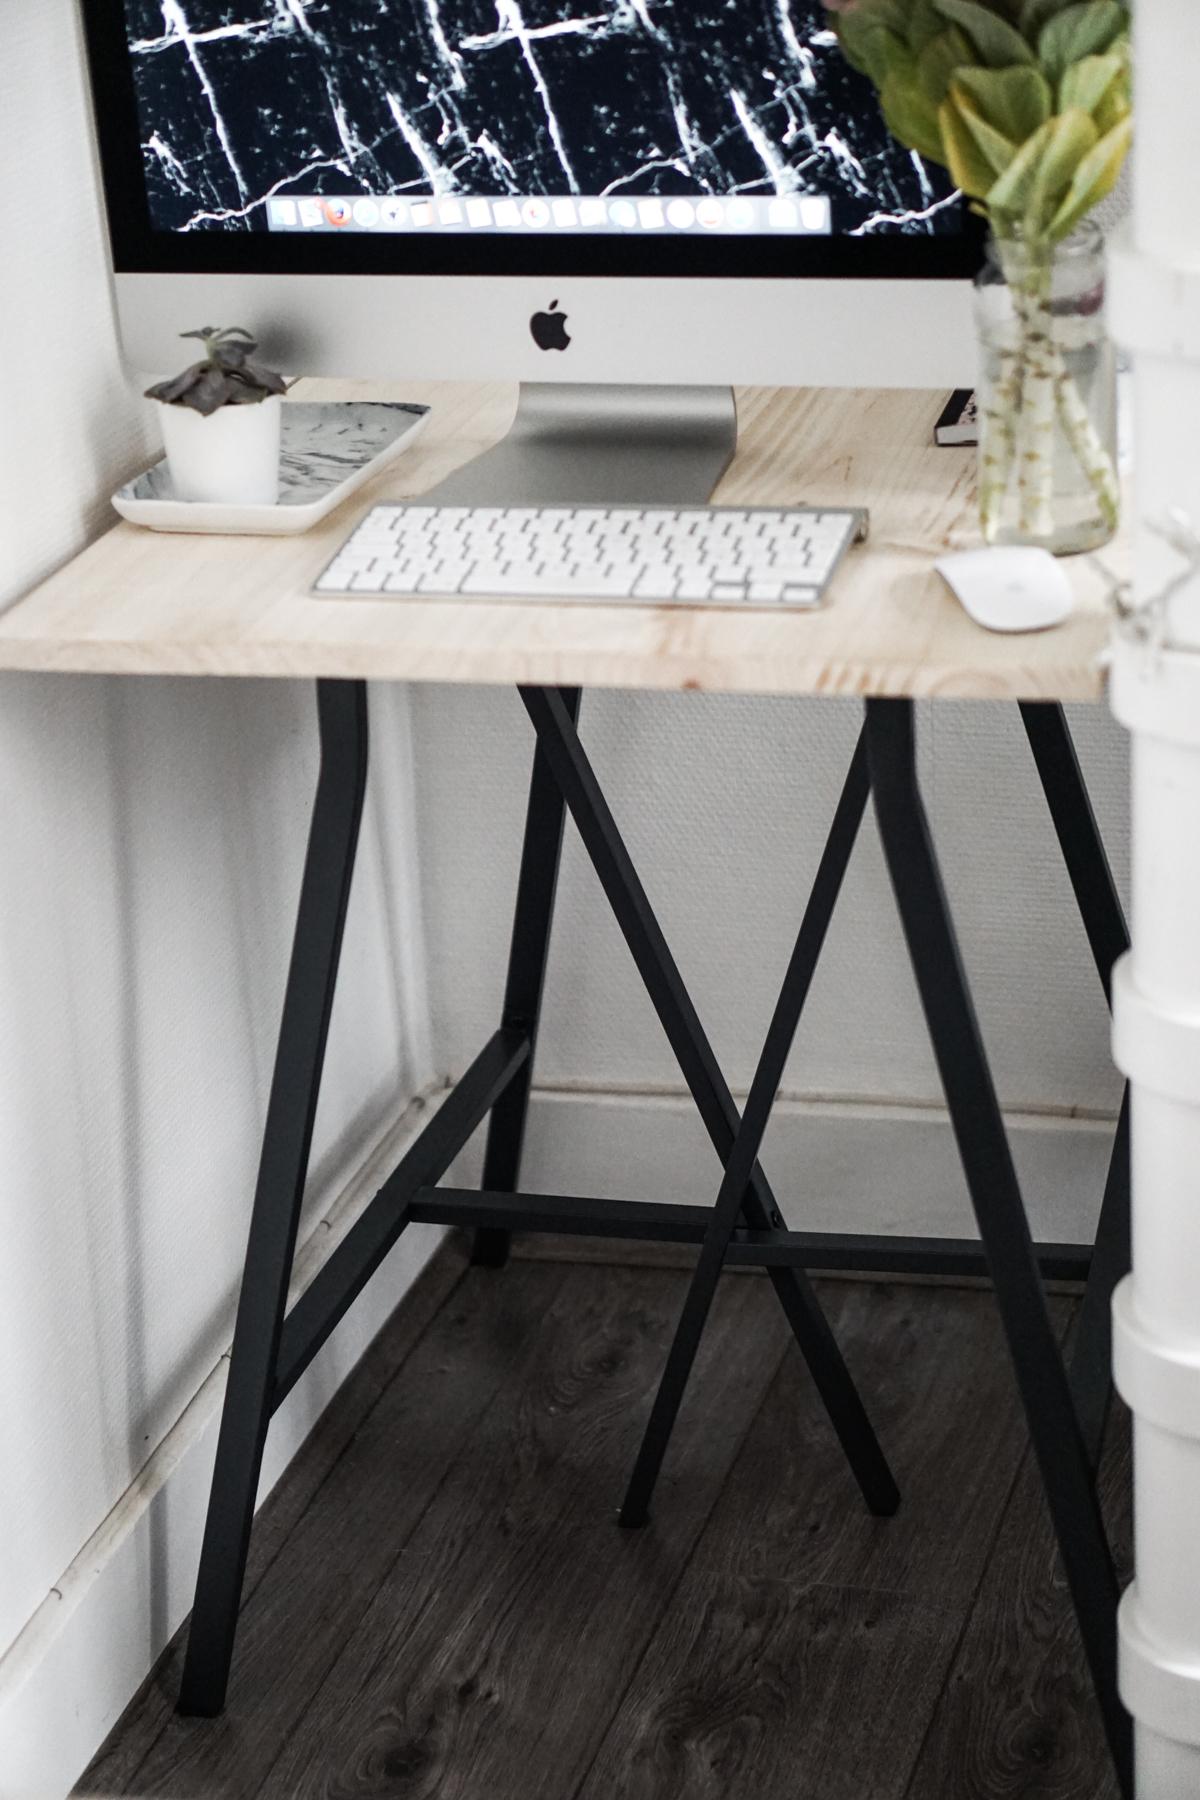 DIY Un Bureau Pour Moins De 30 N O H O L I T A